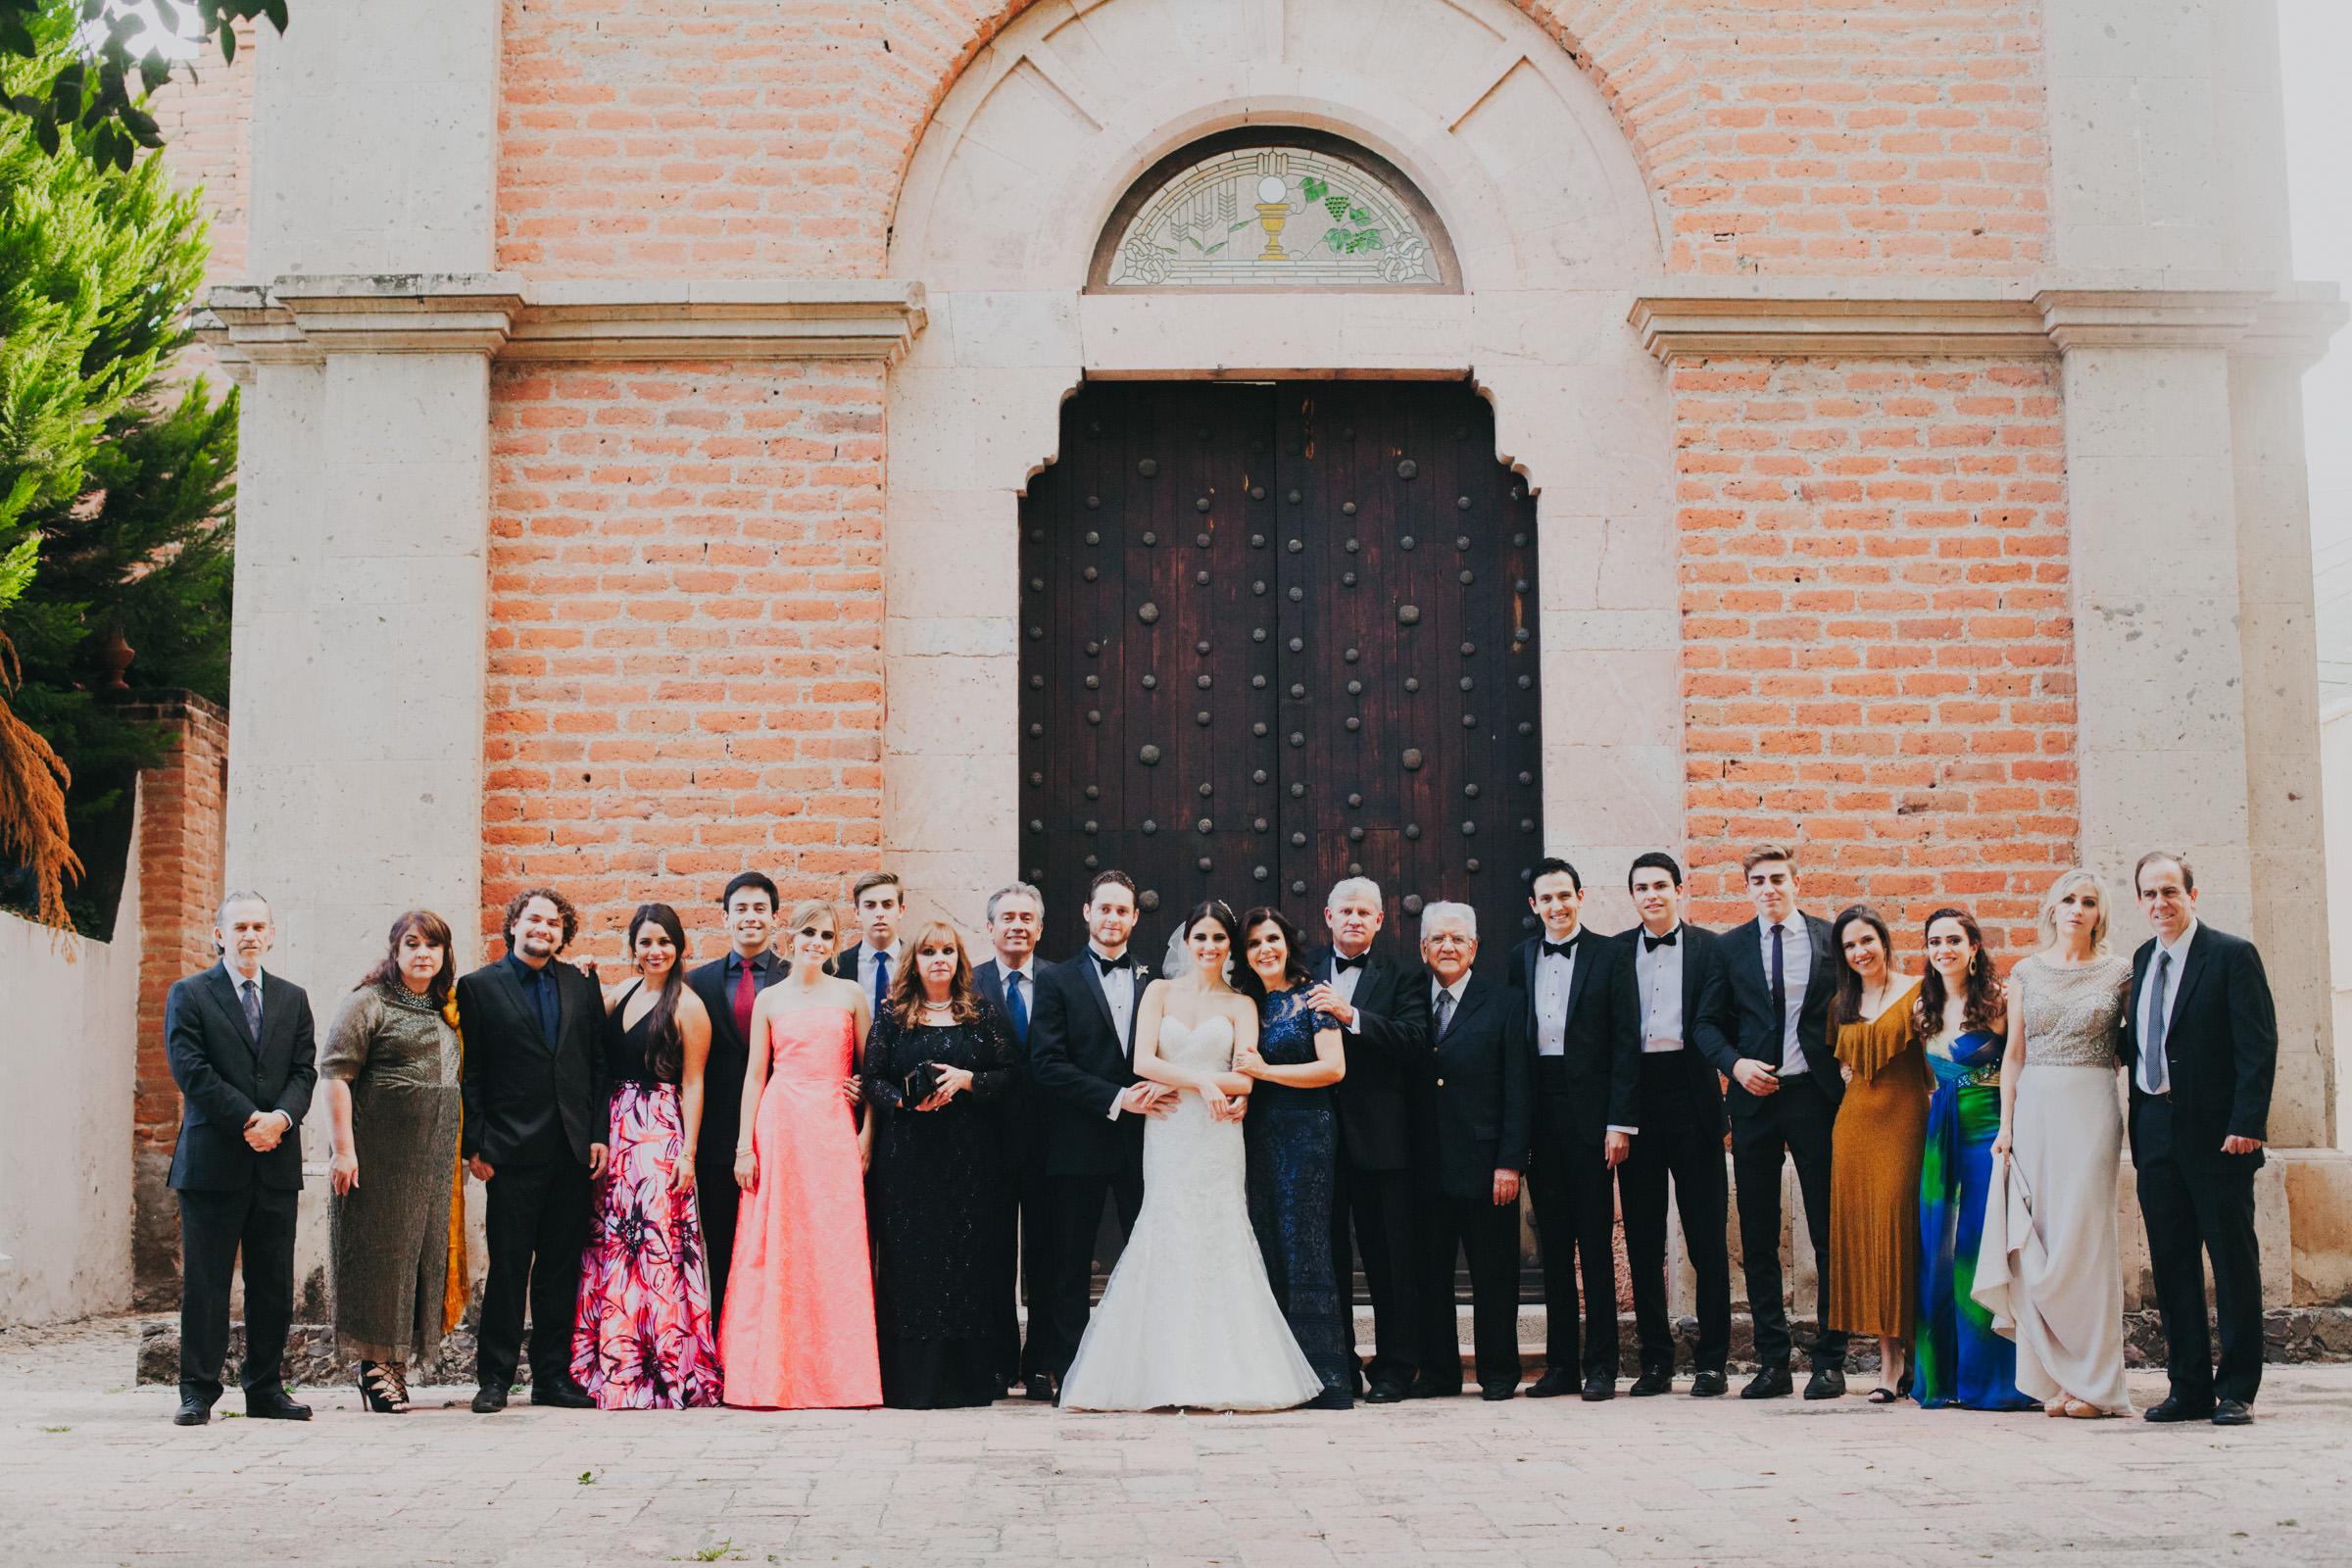 irapuato-boda-fotografia-jardines-alcalde-guanajuato-paulina-juan-pedro--89.jpg